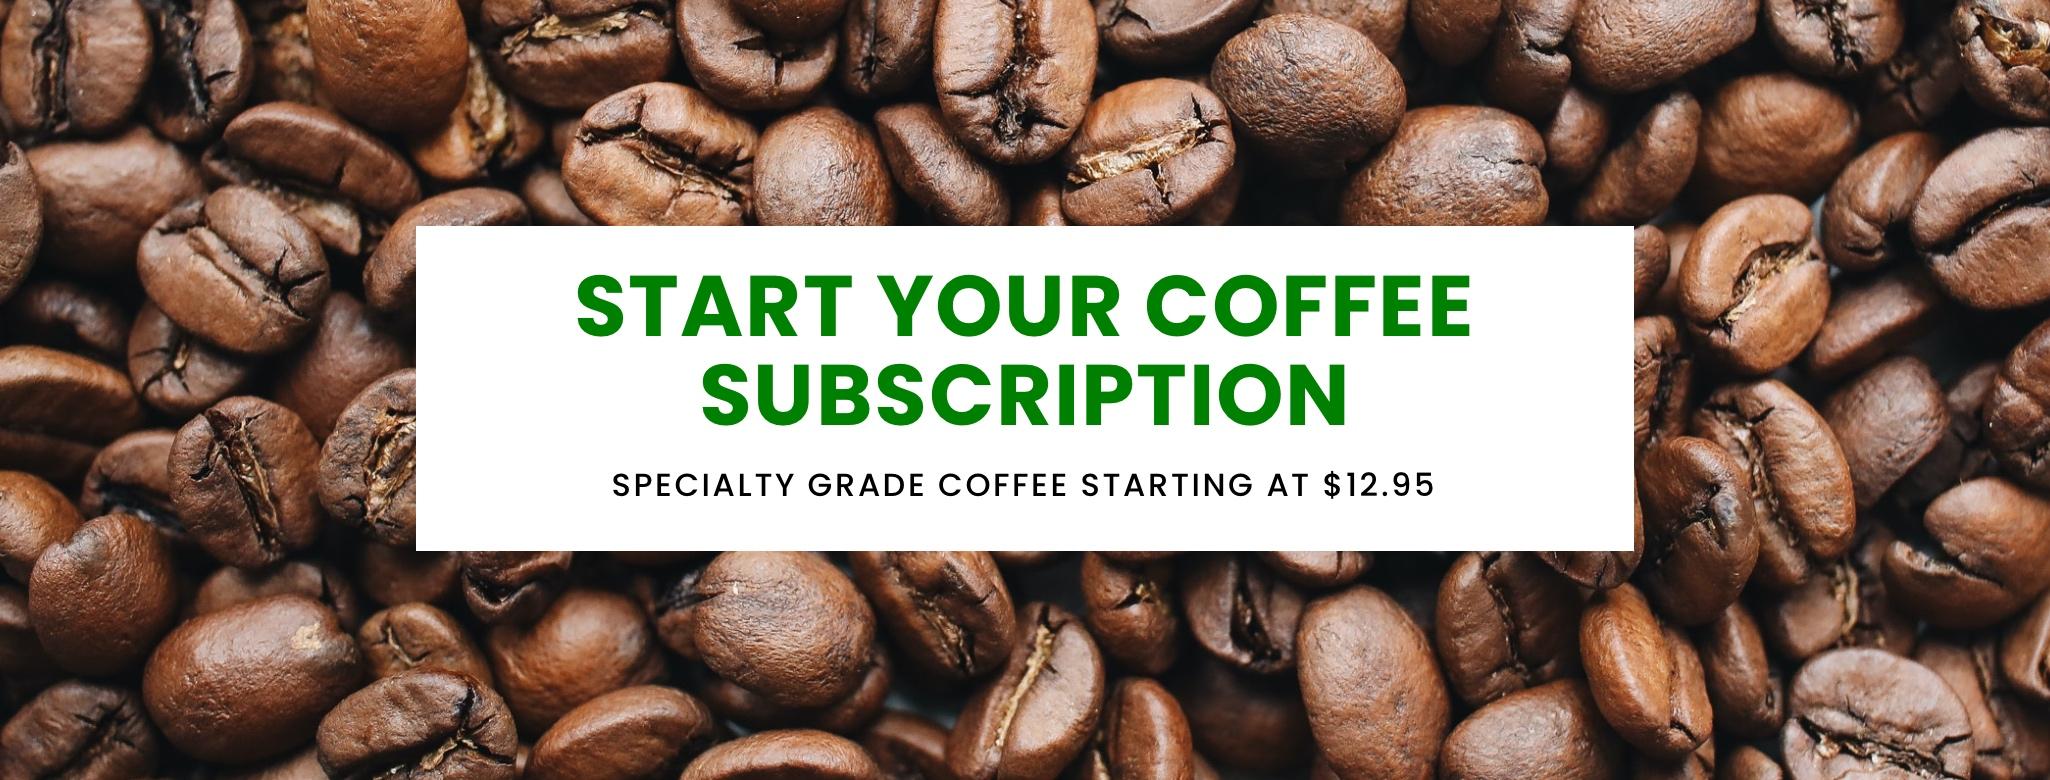 subscription-banner.jpg